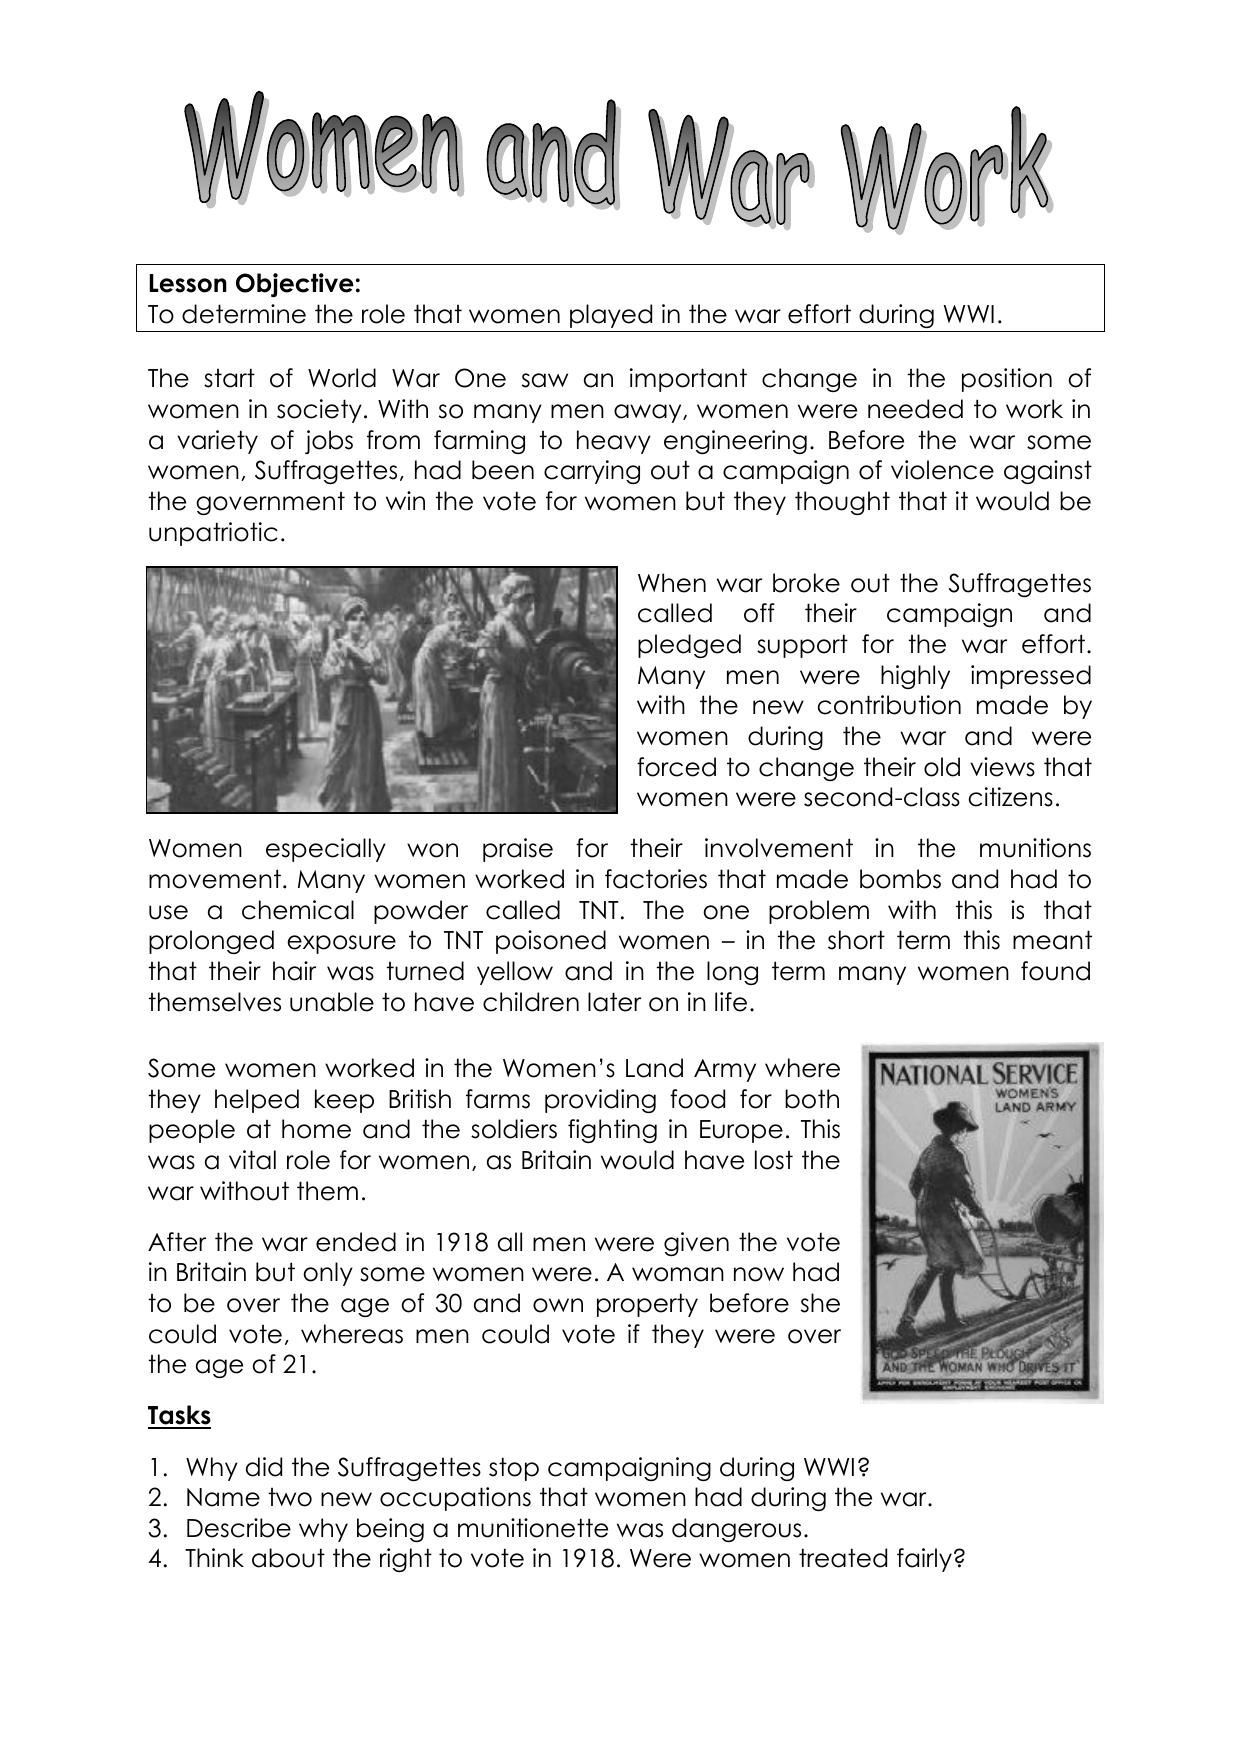 medium resolution of Crash Course Us History Worksheets Pdf   Crash course us history